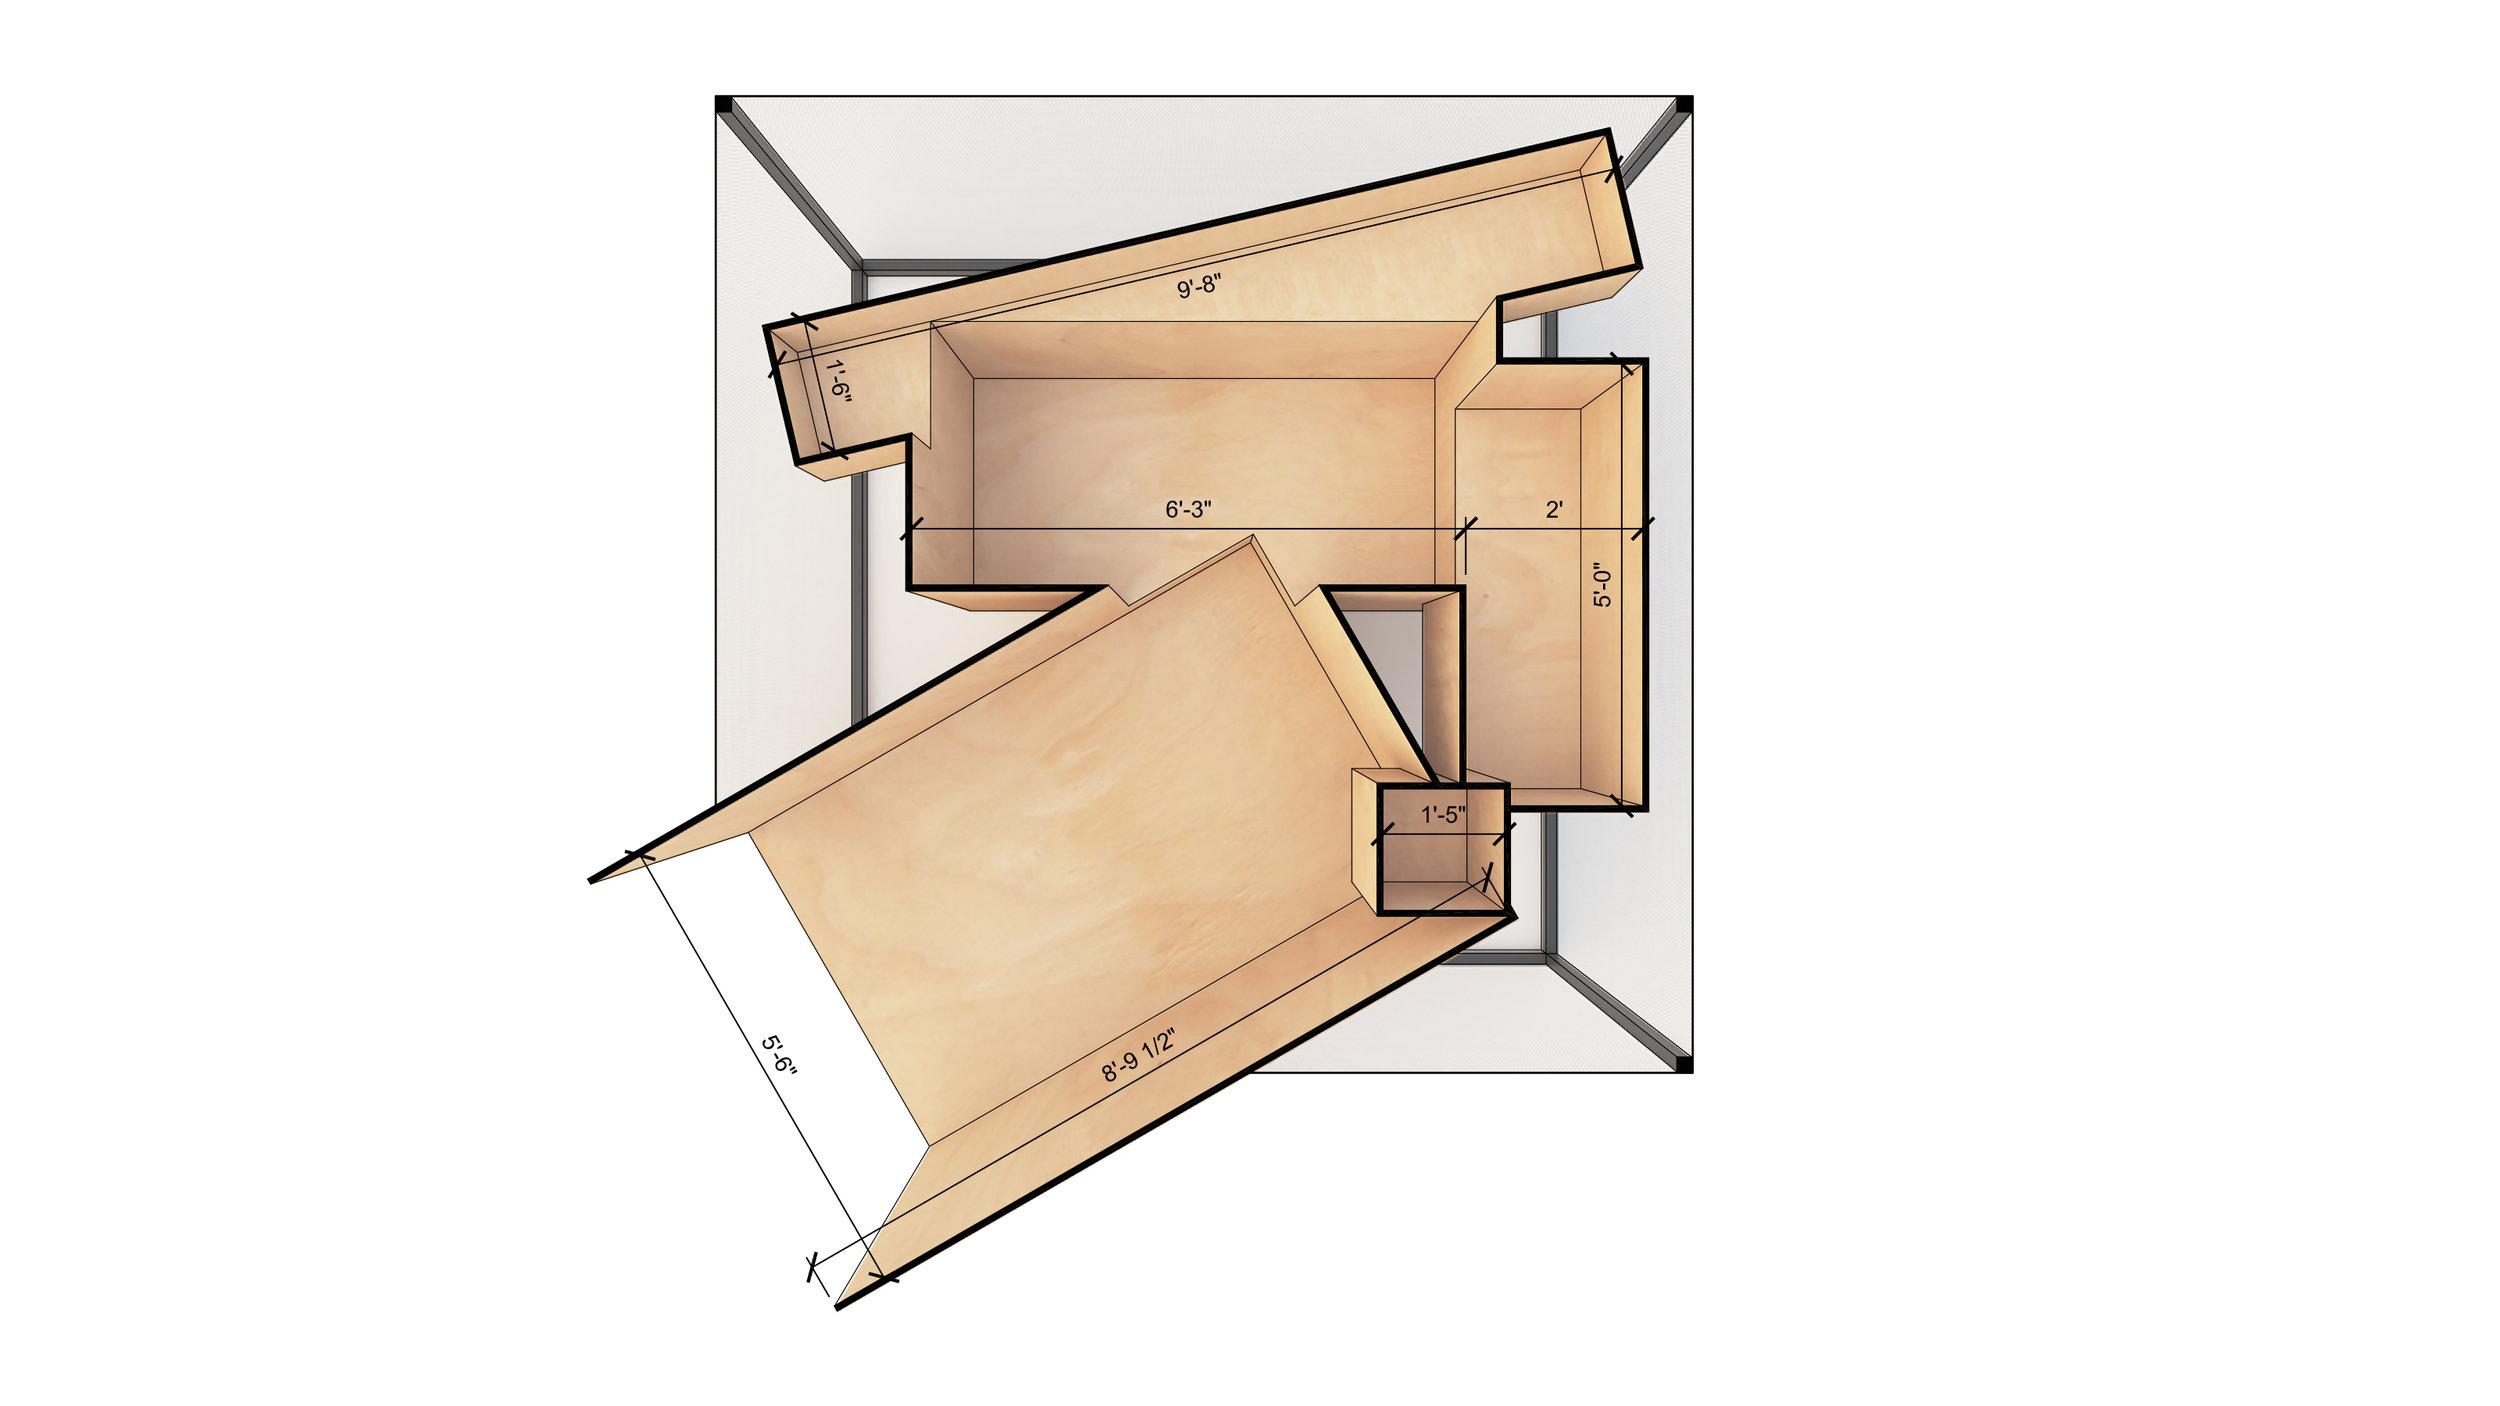 MTAD_SEATTLE DESIGN GRANT_PLAN.jpg